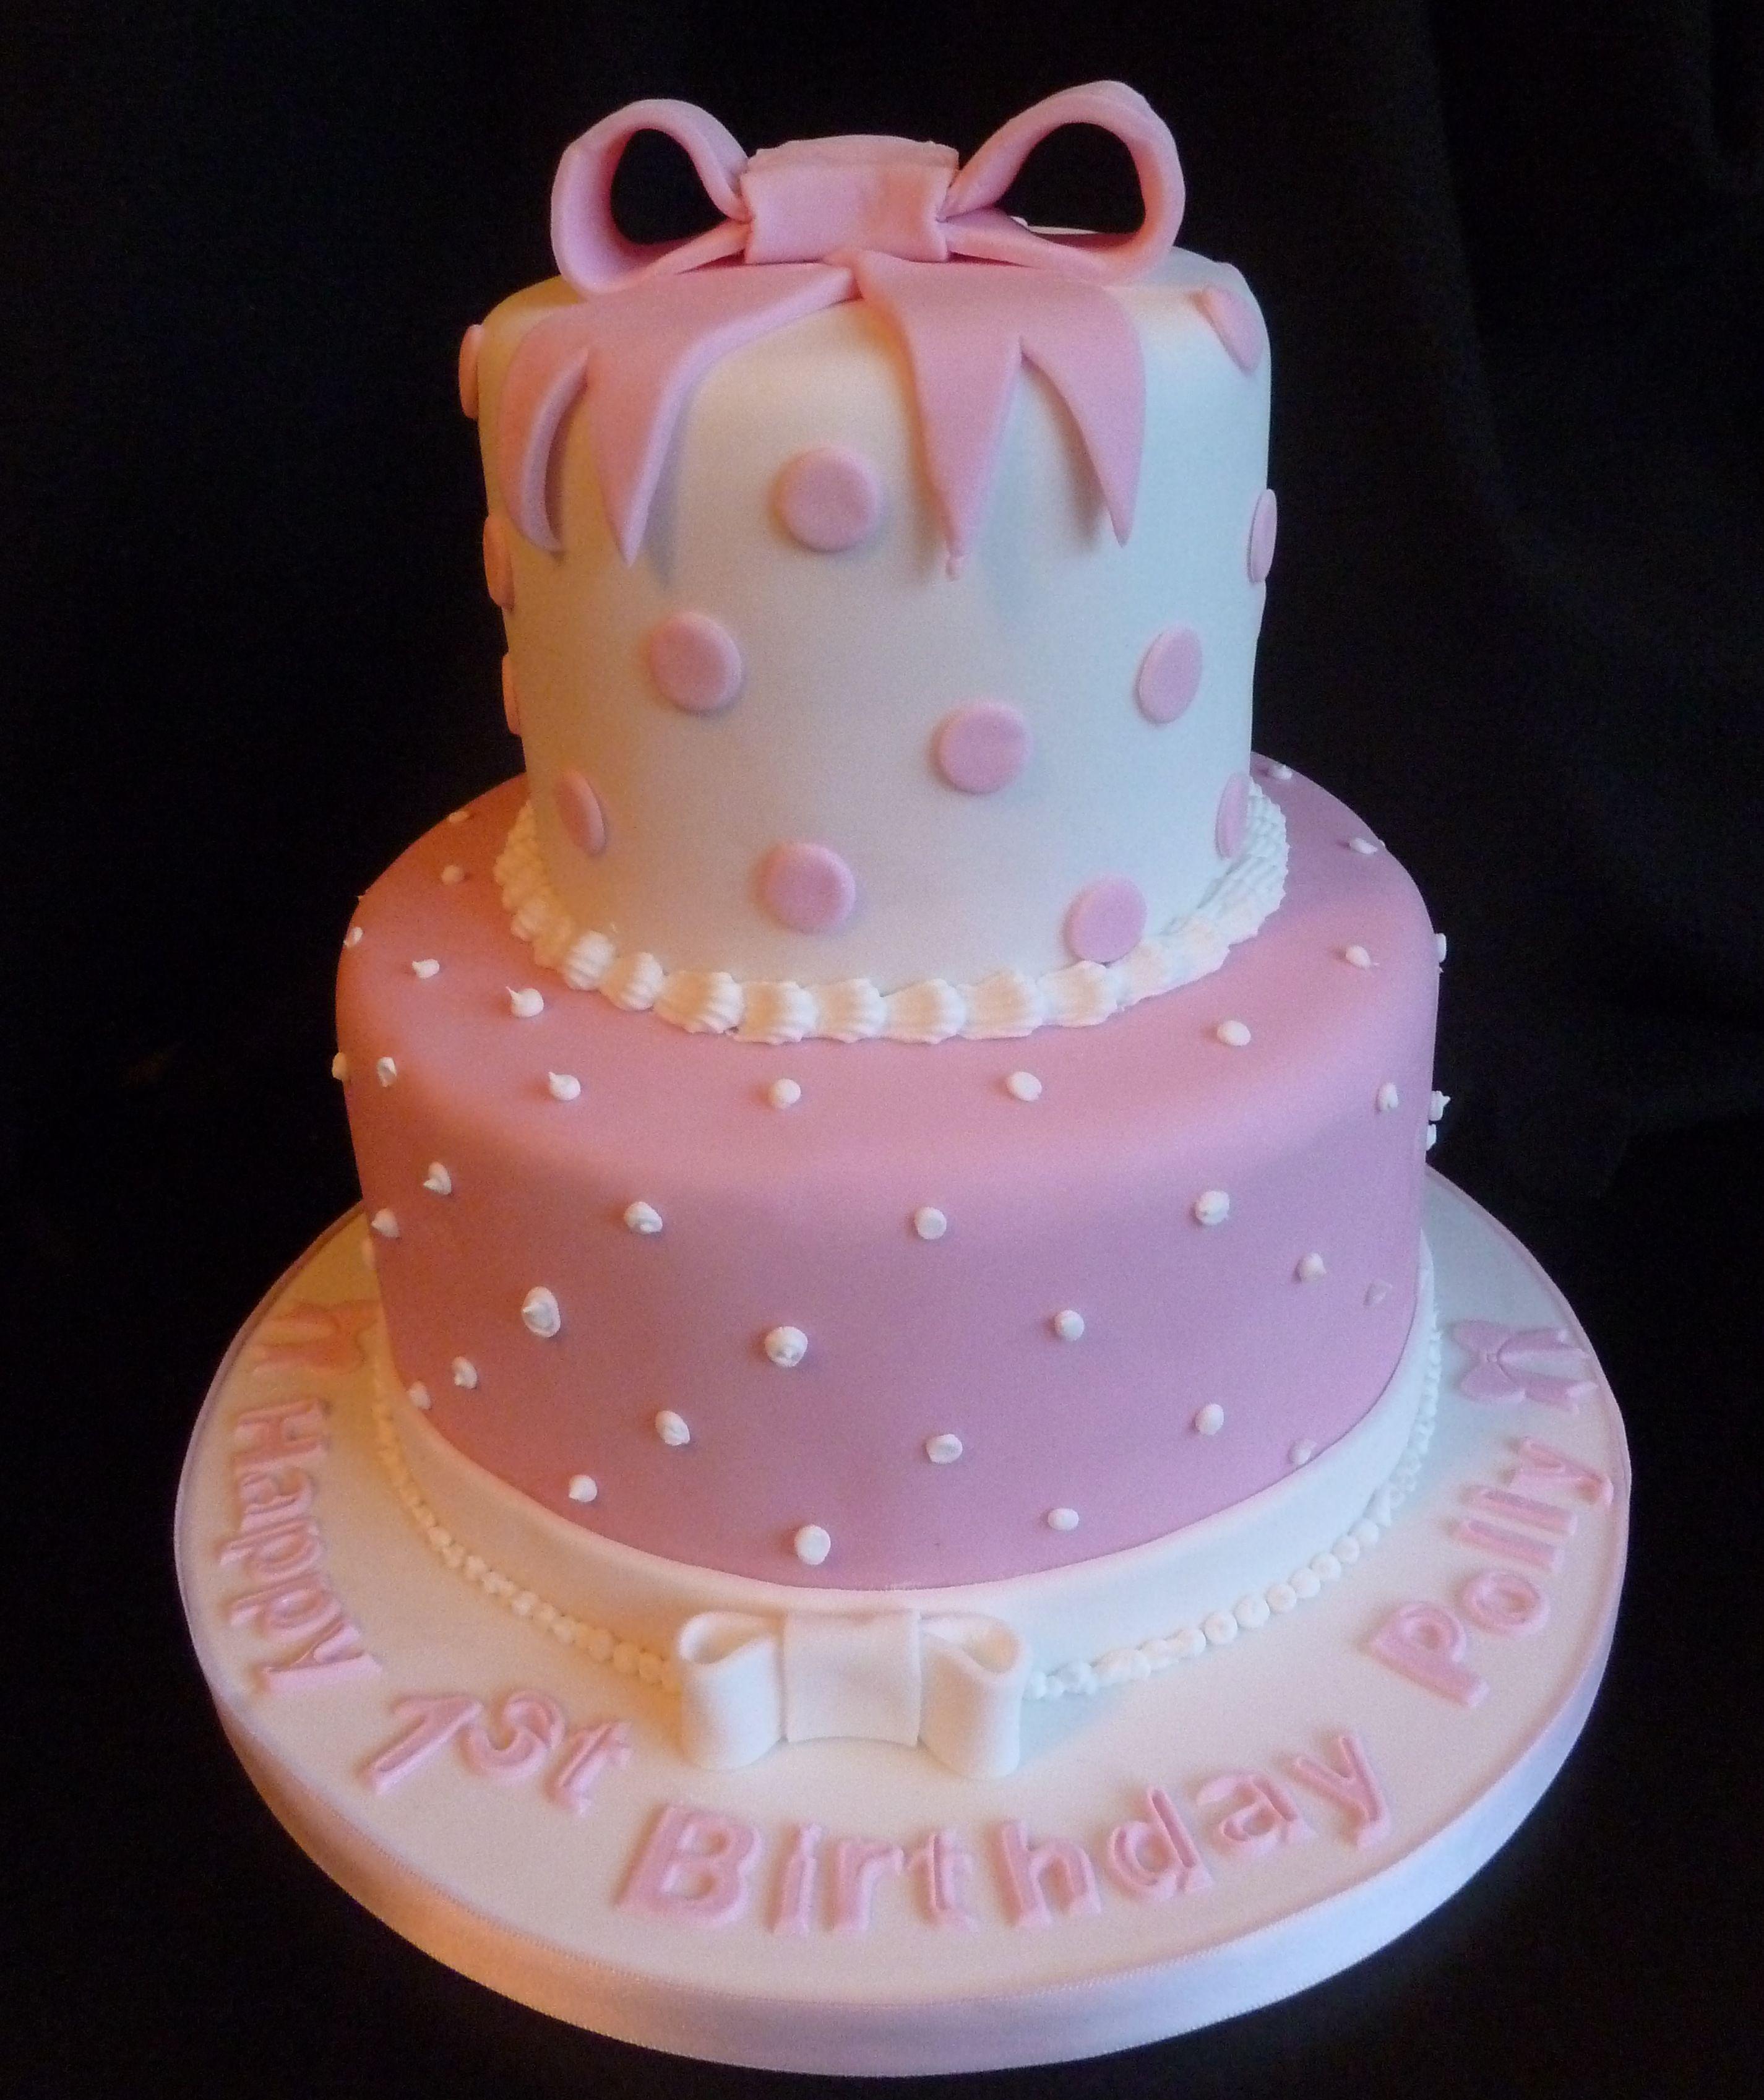 Cartoon Cake Designs For Birthdays